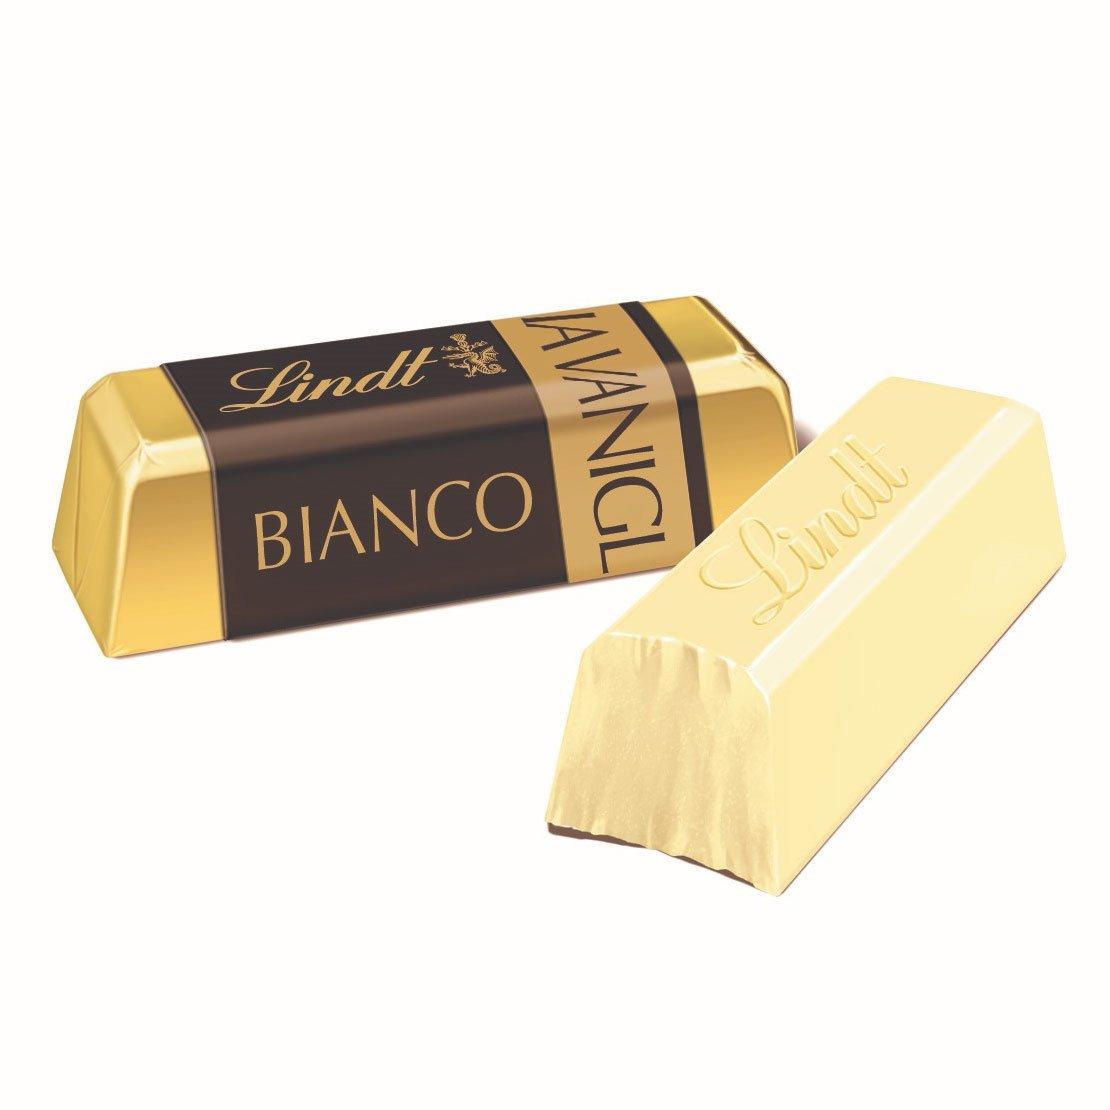 Weiße Chocolade Stengli, Bianco, 3000 g